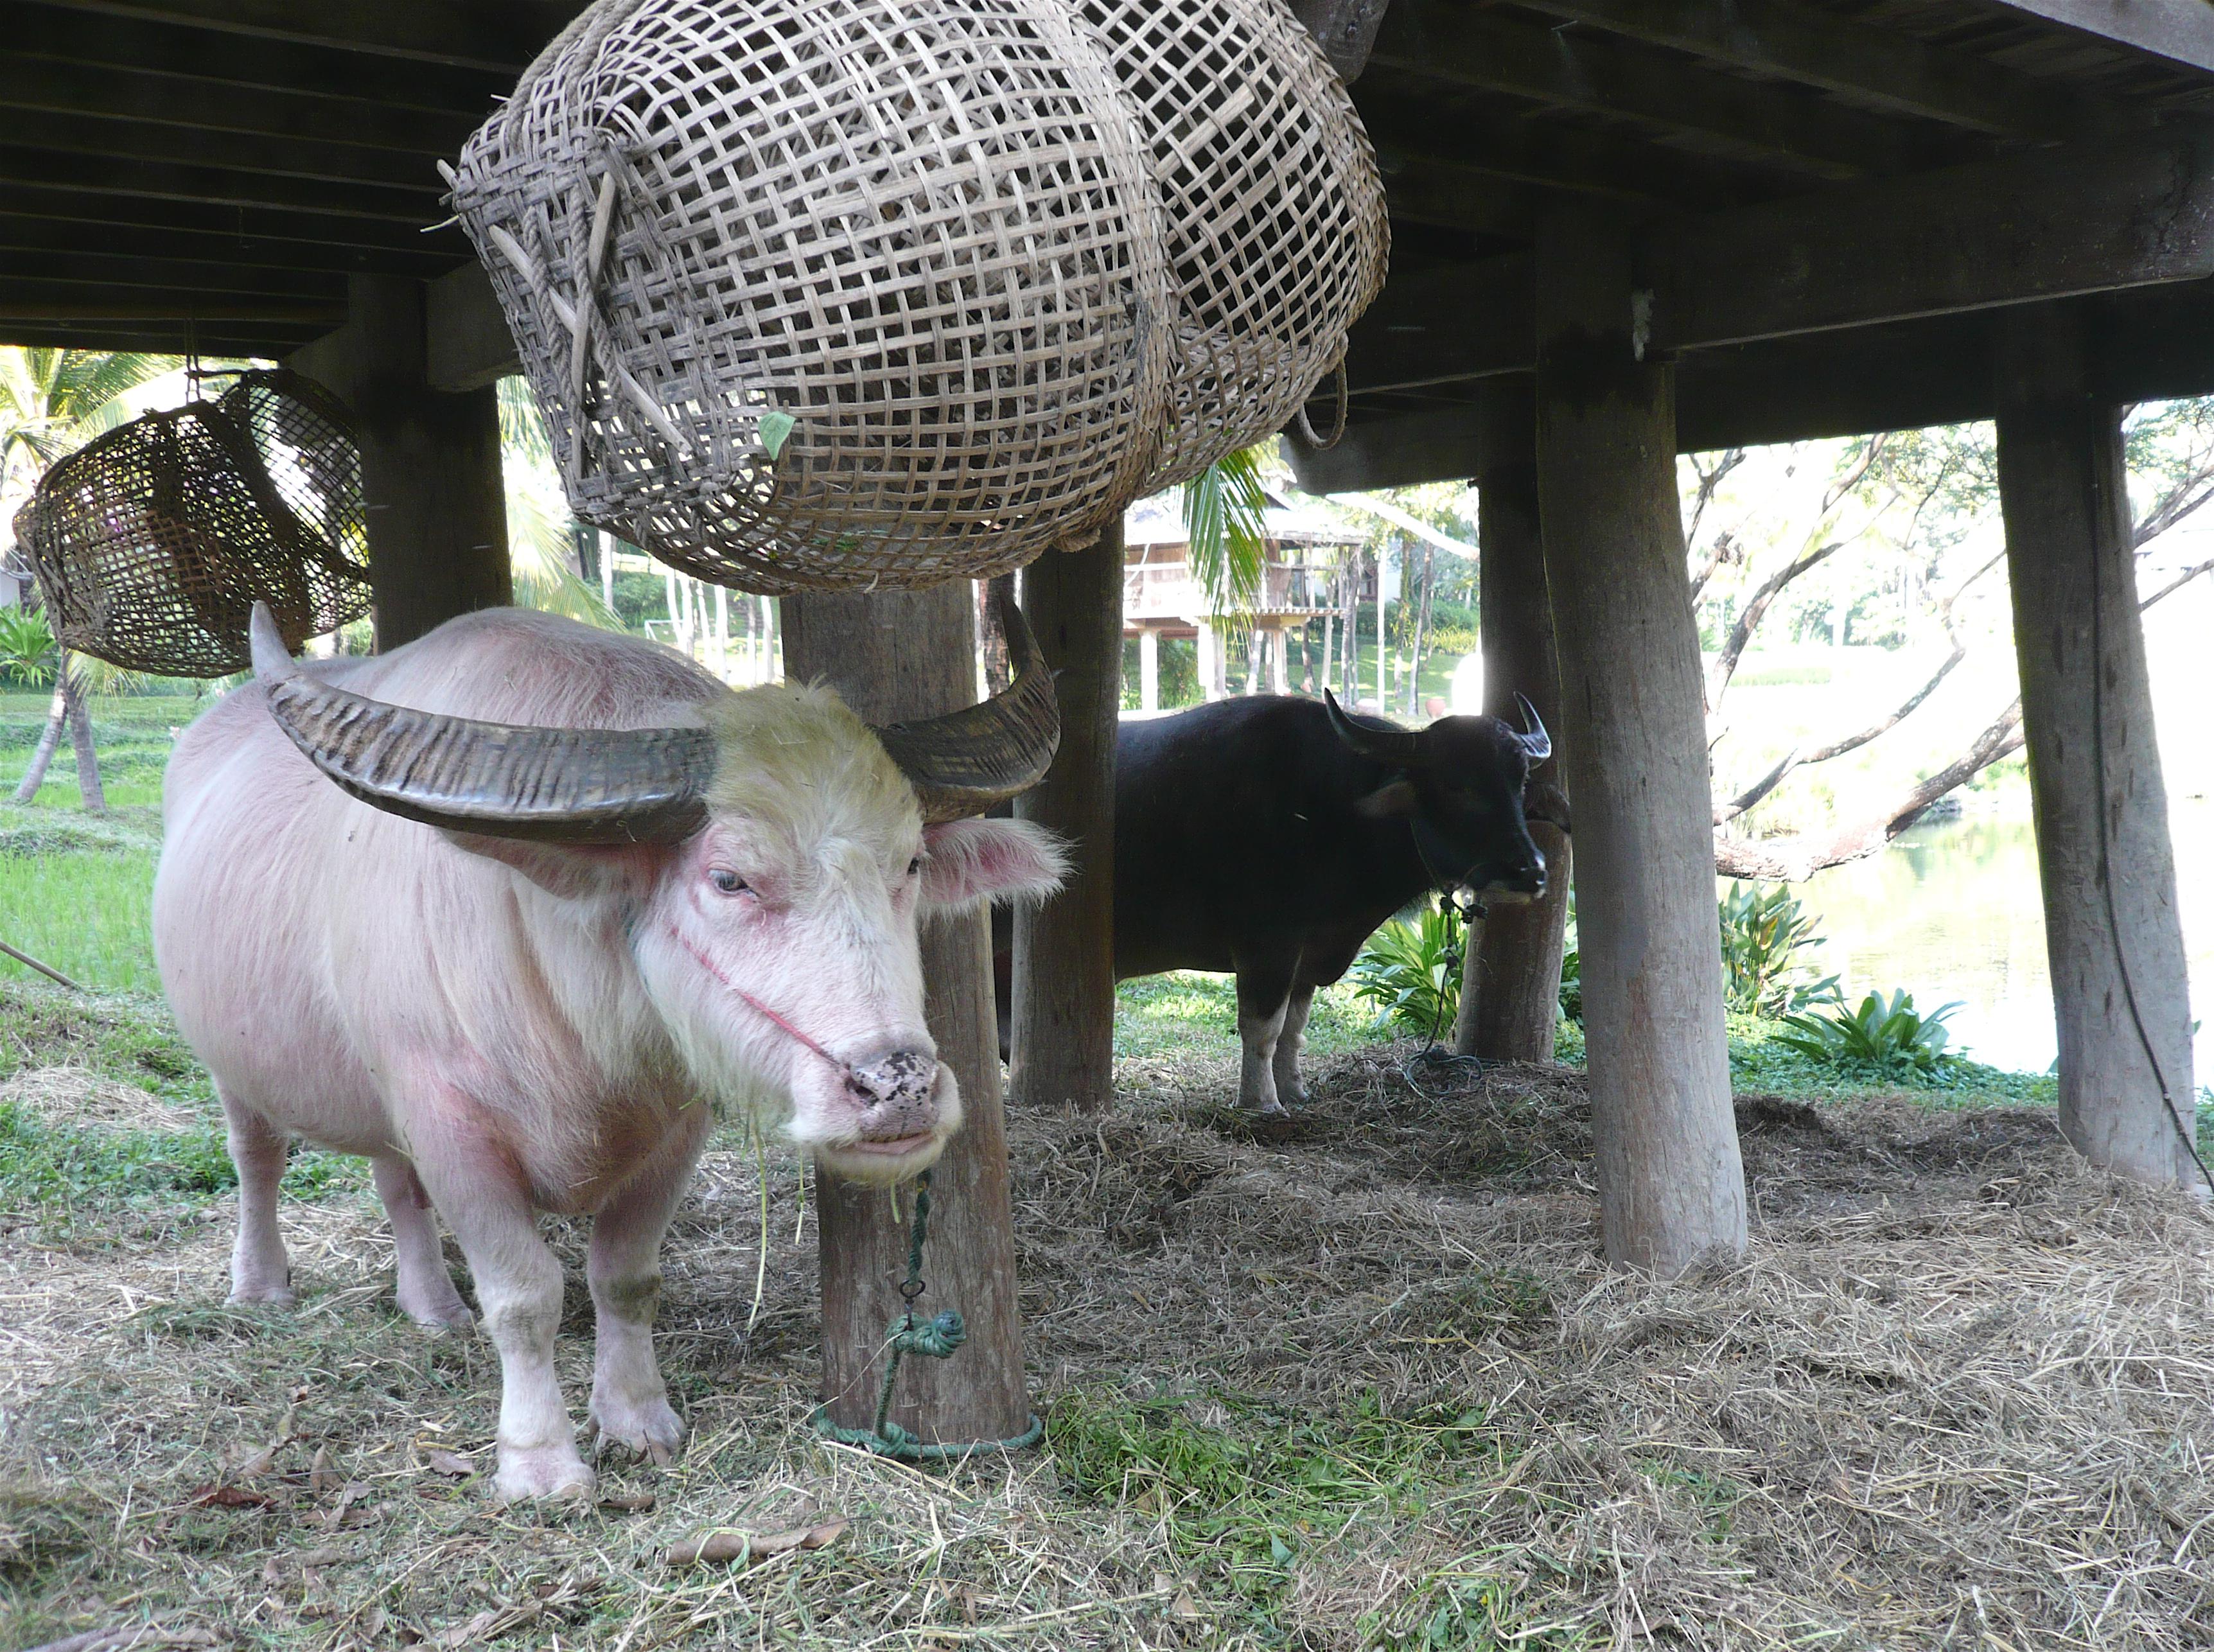 http://upload.wikimedia.org/wikipedia/commons/6/6b/Albino_Water_Buffalo,_Chiang_Mai.jpg